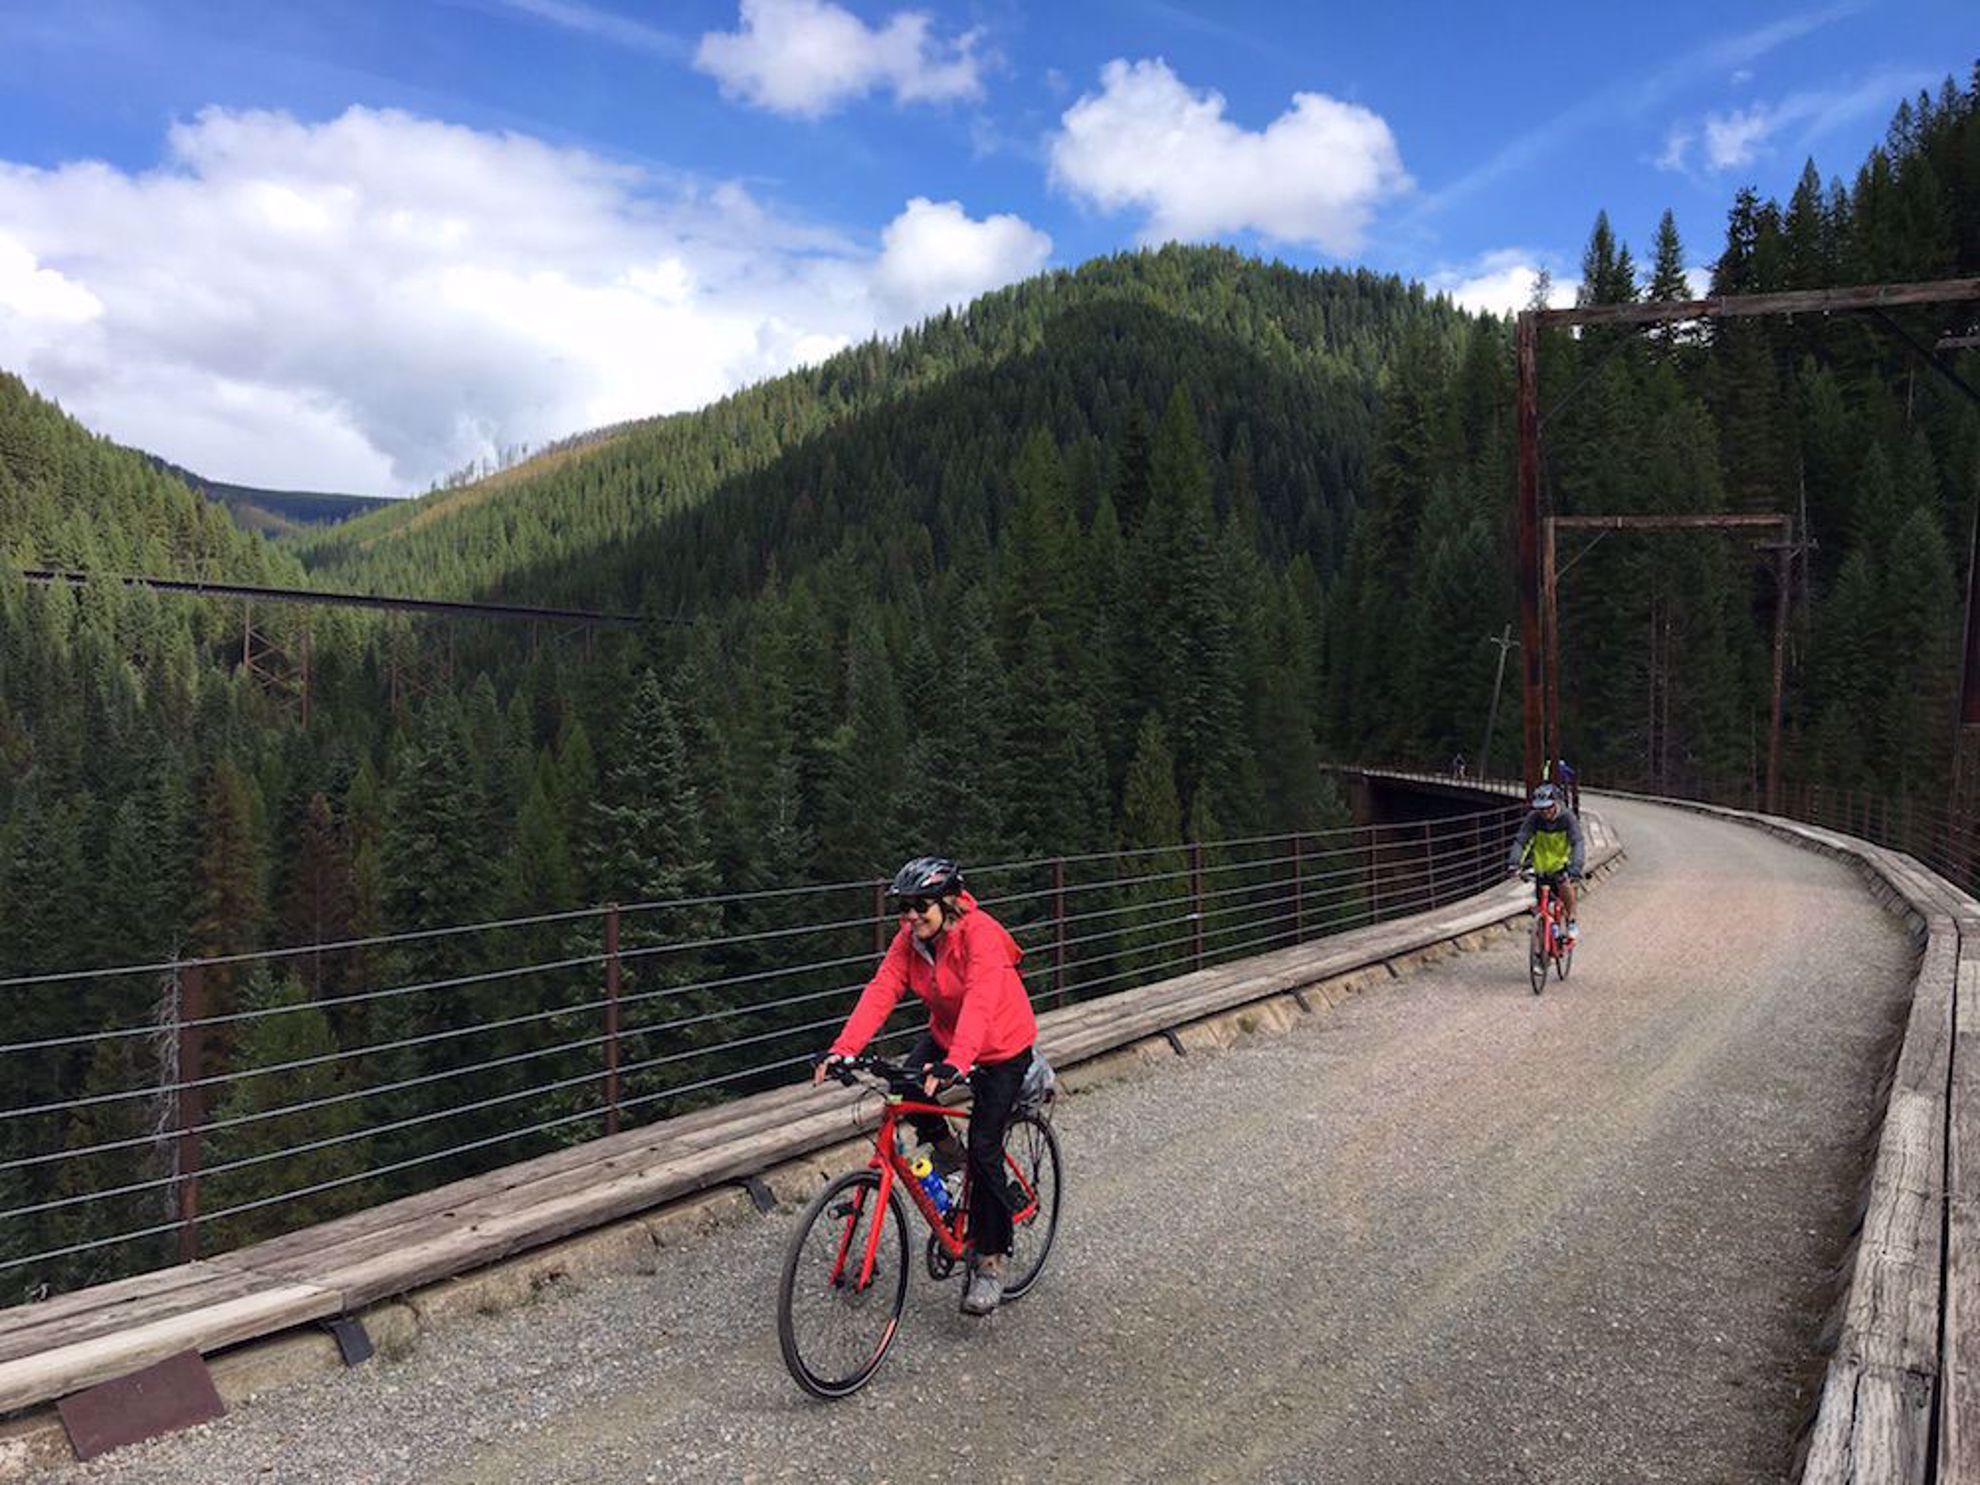 Riding the railroad trestles